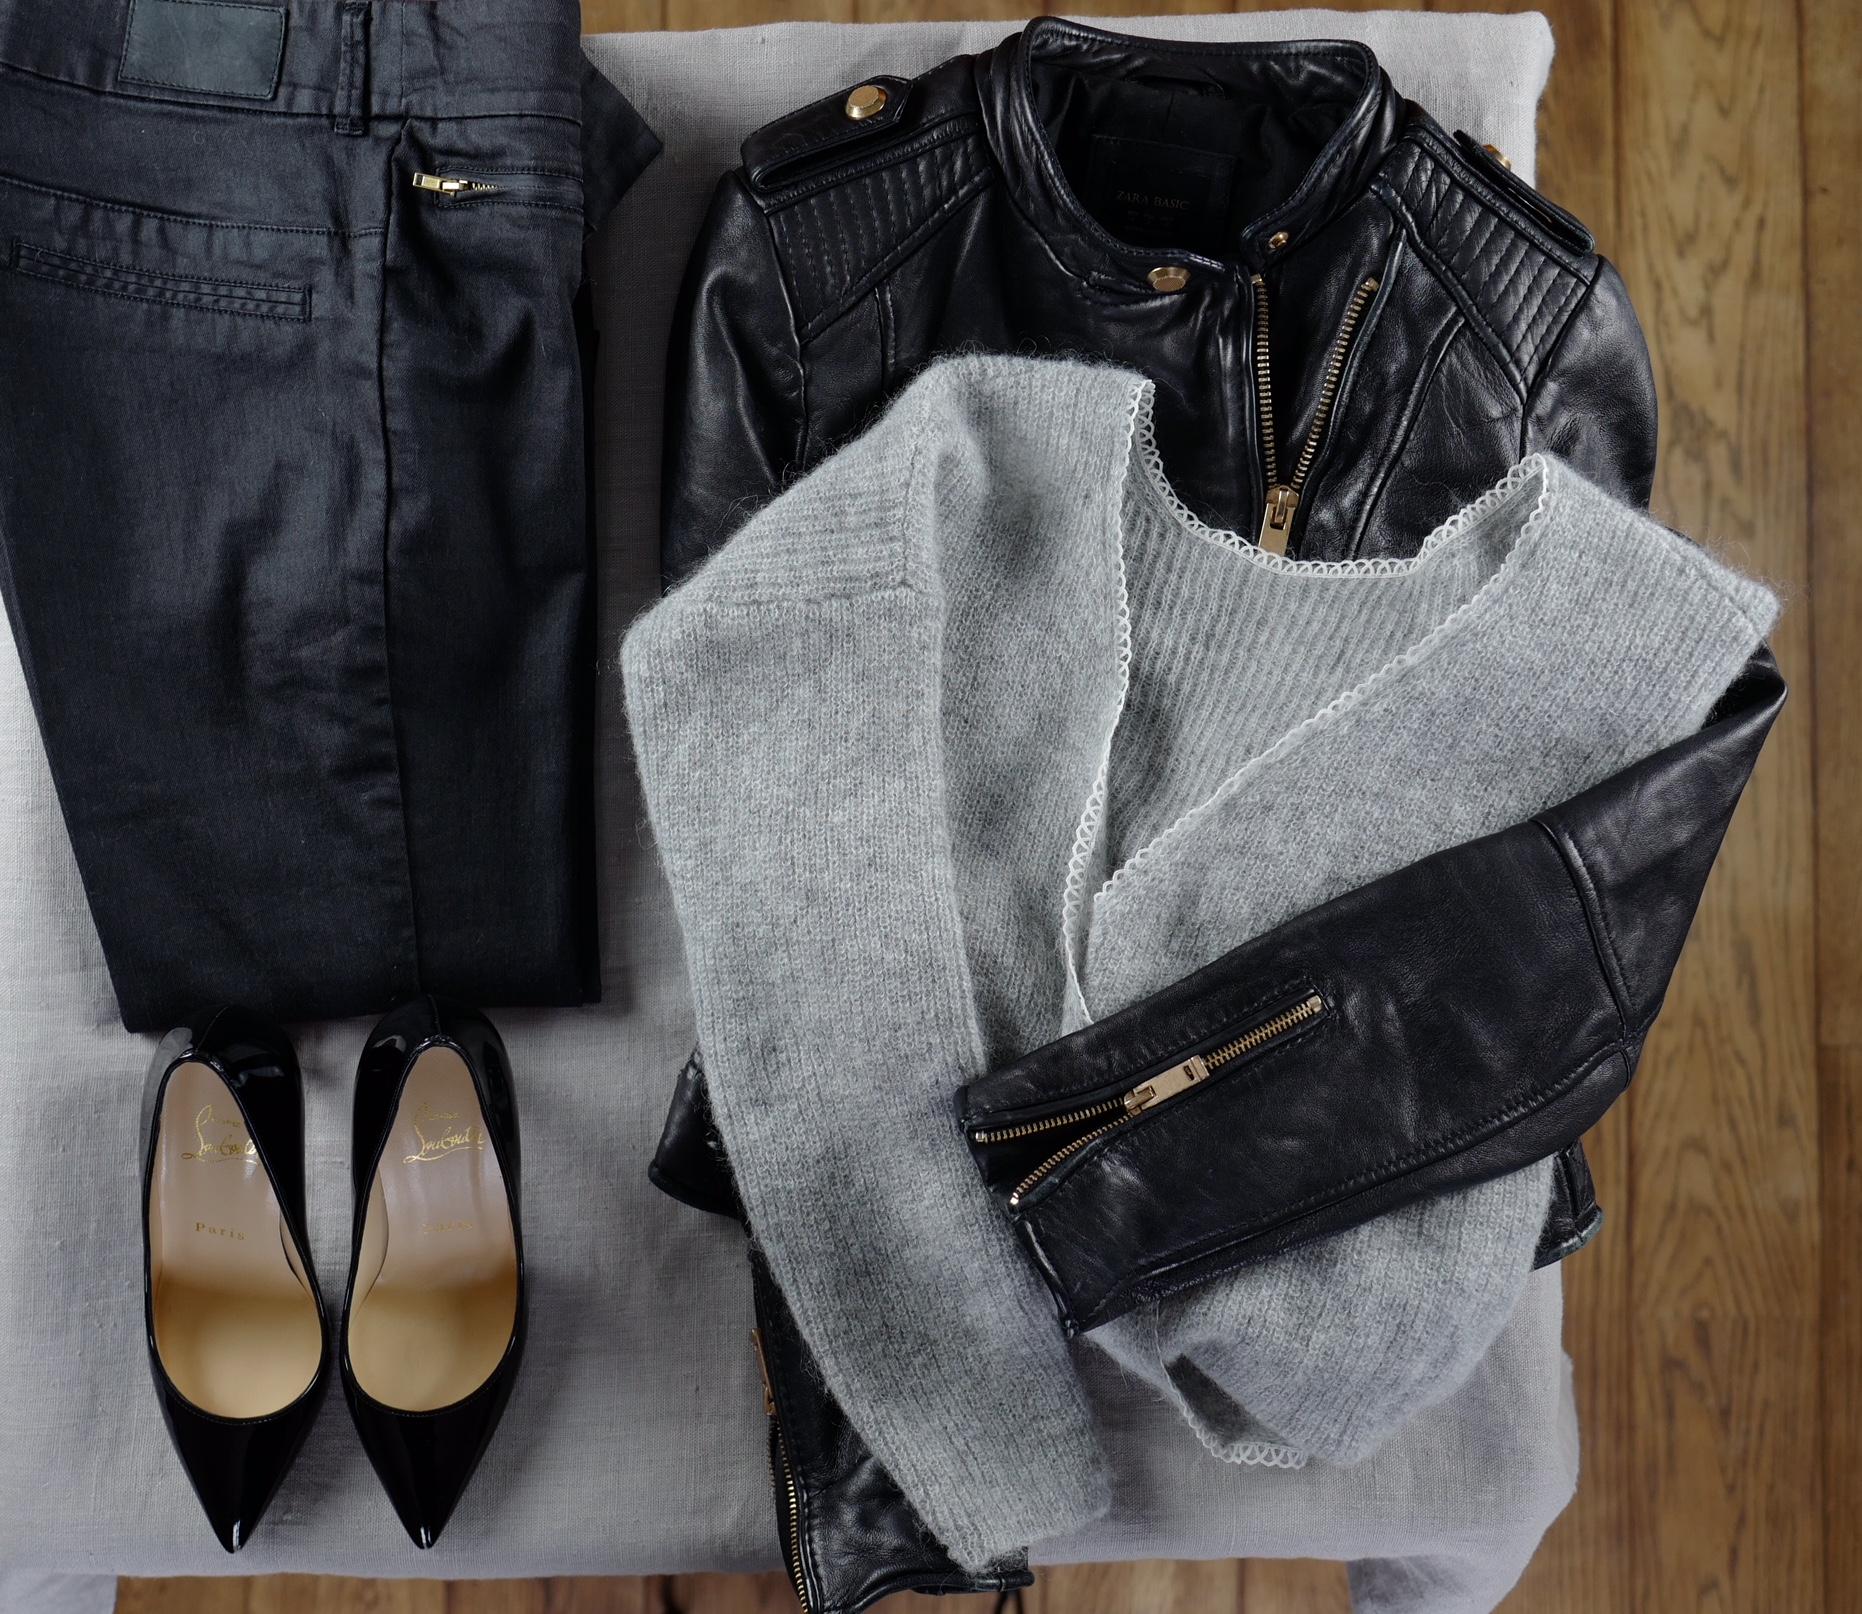 Pantalon H&M, pull Sophie Sezane, escarpins noirs vernis CosmoParis, blouson cuir Zara